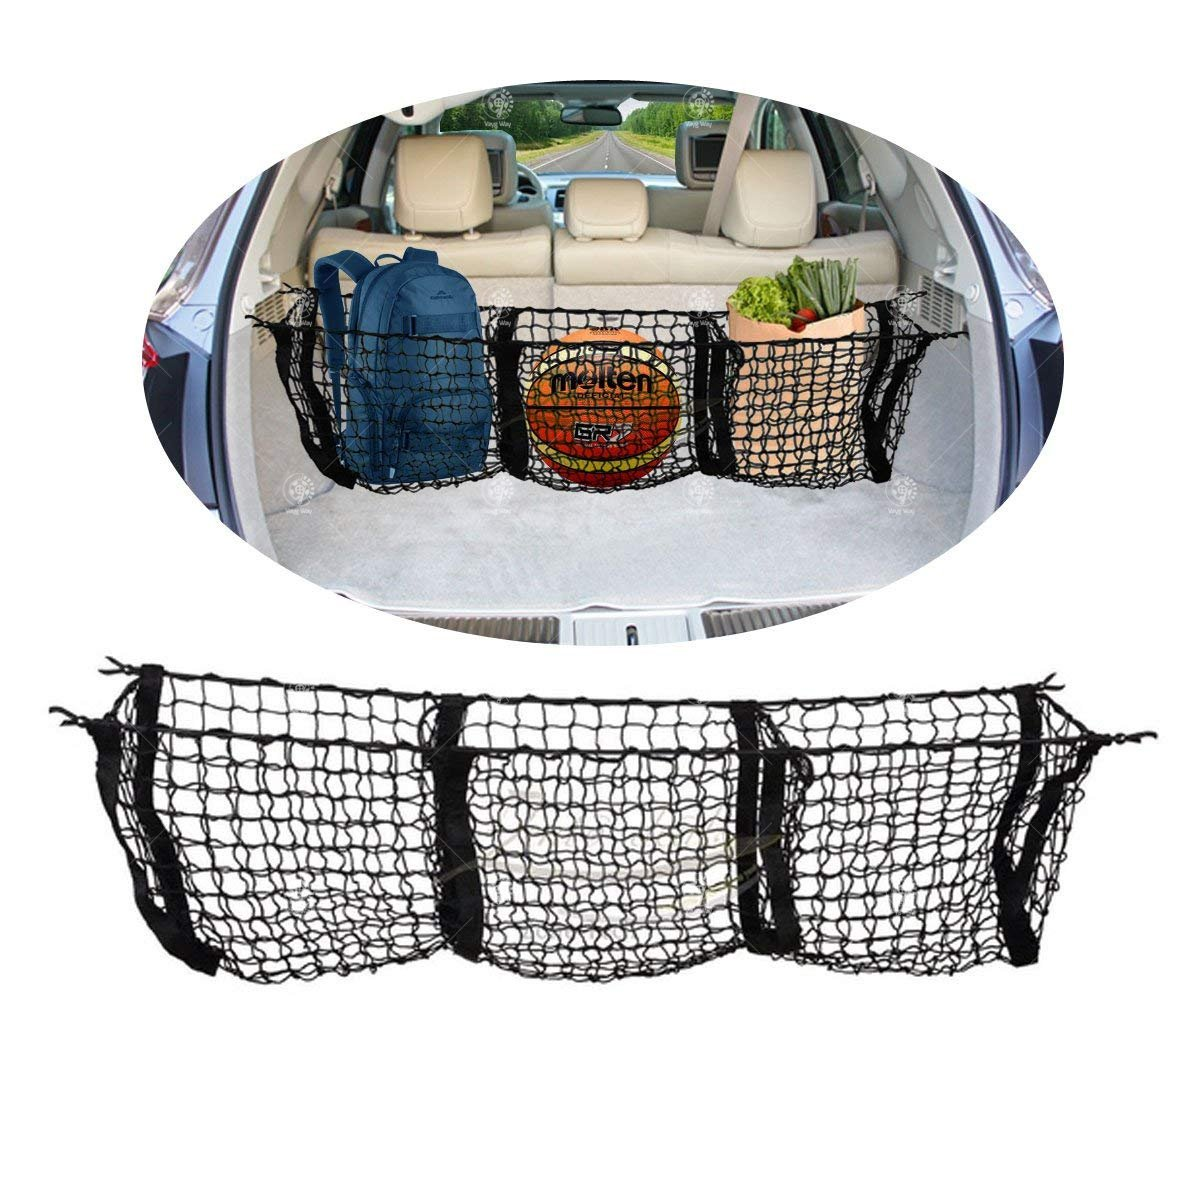 Truck Bed Cargo Net >> Vaygway Mesh Three Pocket Net Truck Bed Cargo Net Organizer Trunk Storage Stretchable Net Car Suv Pickup Truck Bed Divider Organizers